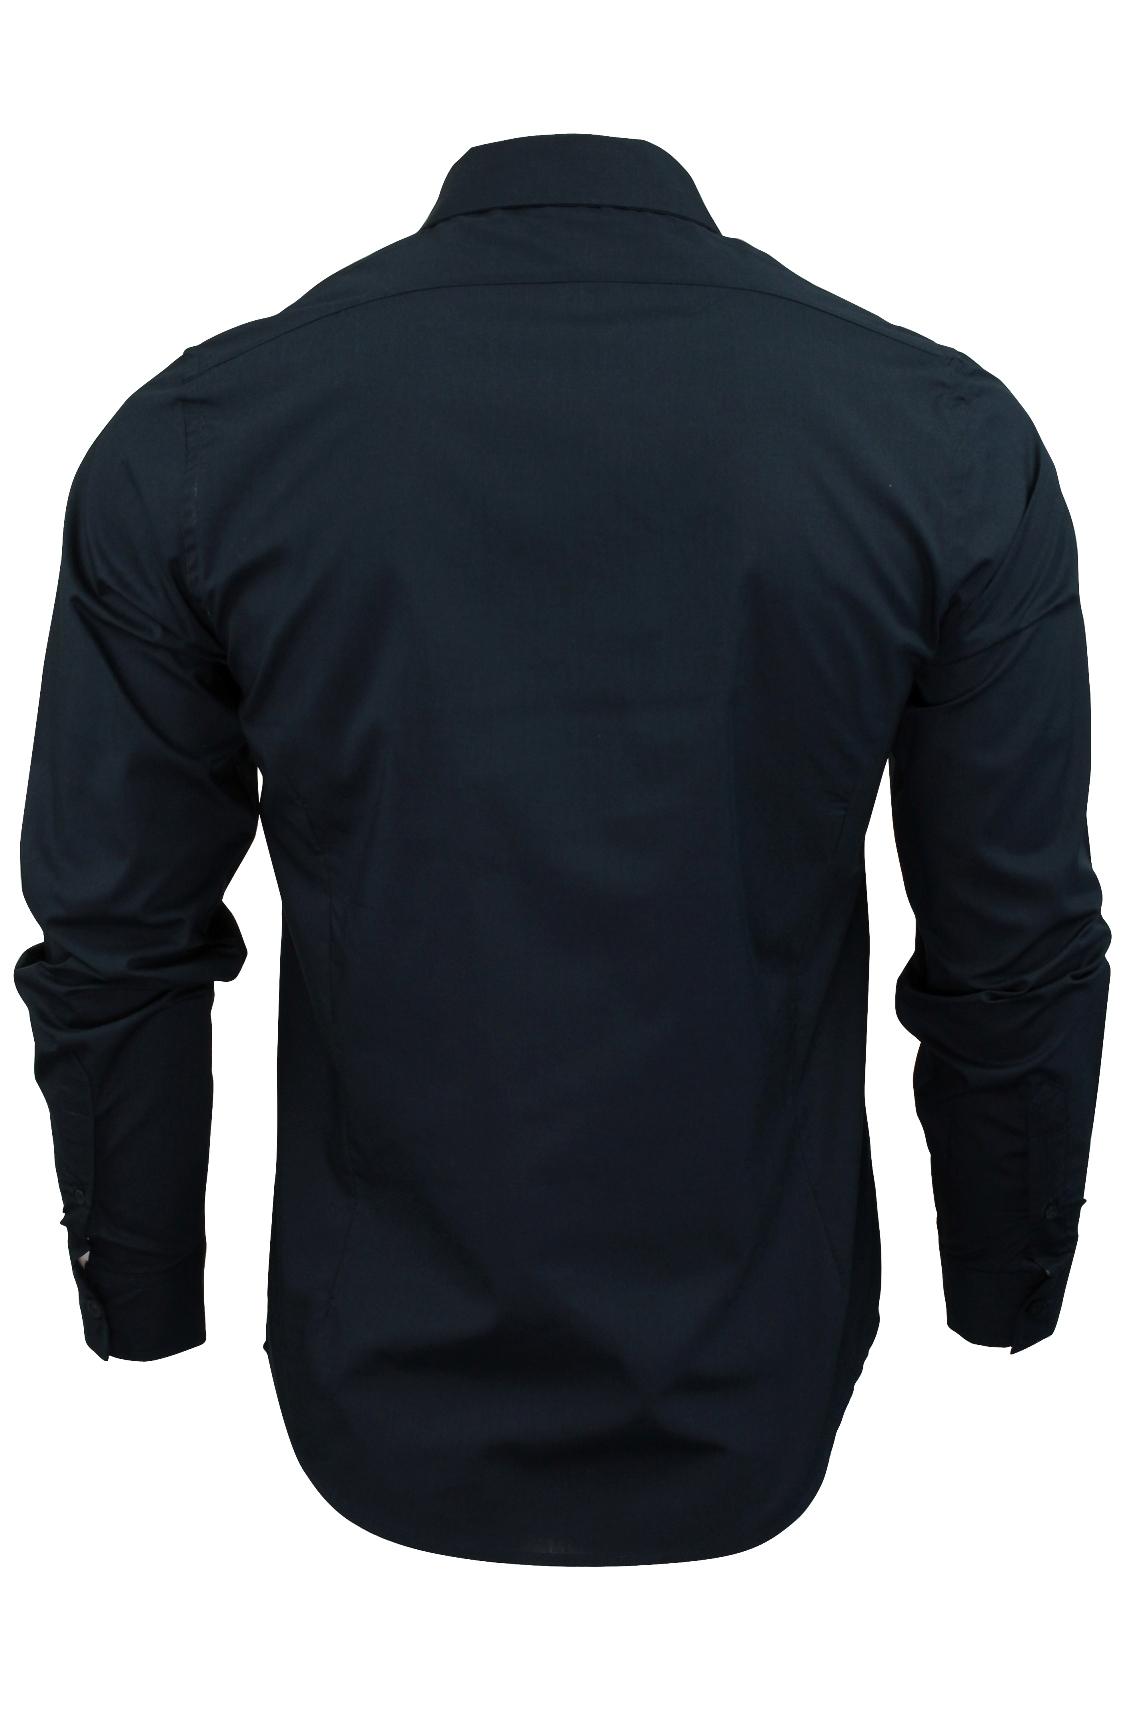 Mens-Plain-Shirt-by-Brave-Soul-039-Tudor-039-Long-Sleeved thumbnail 11